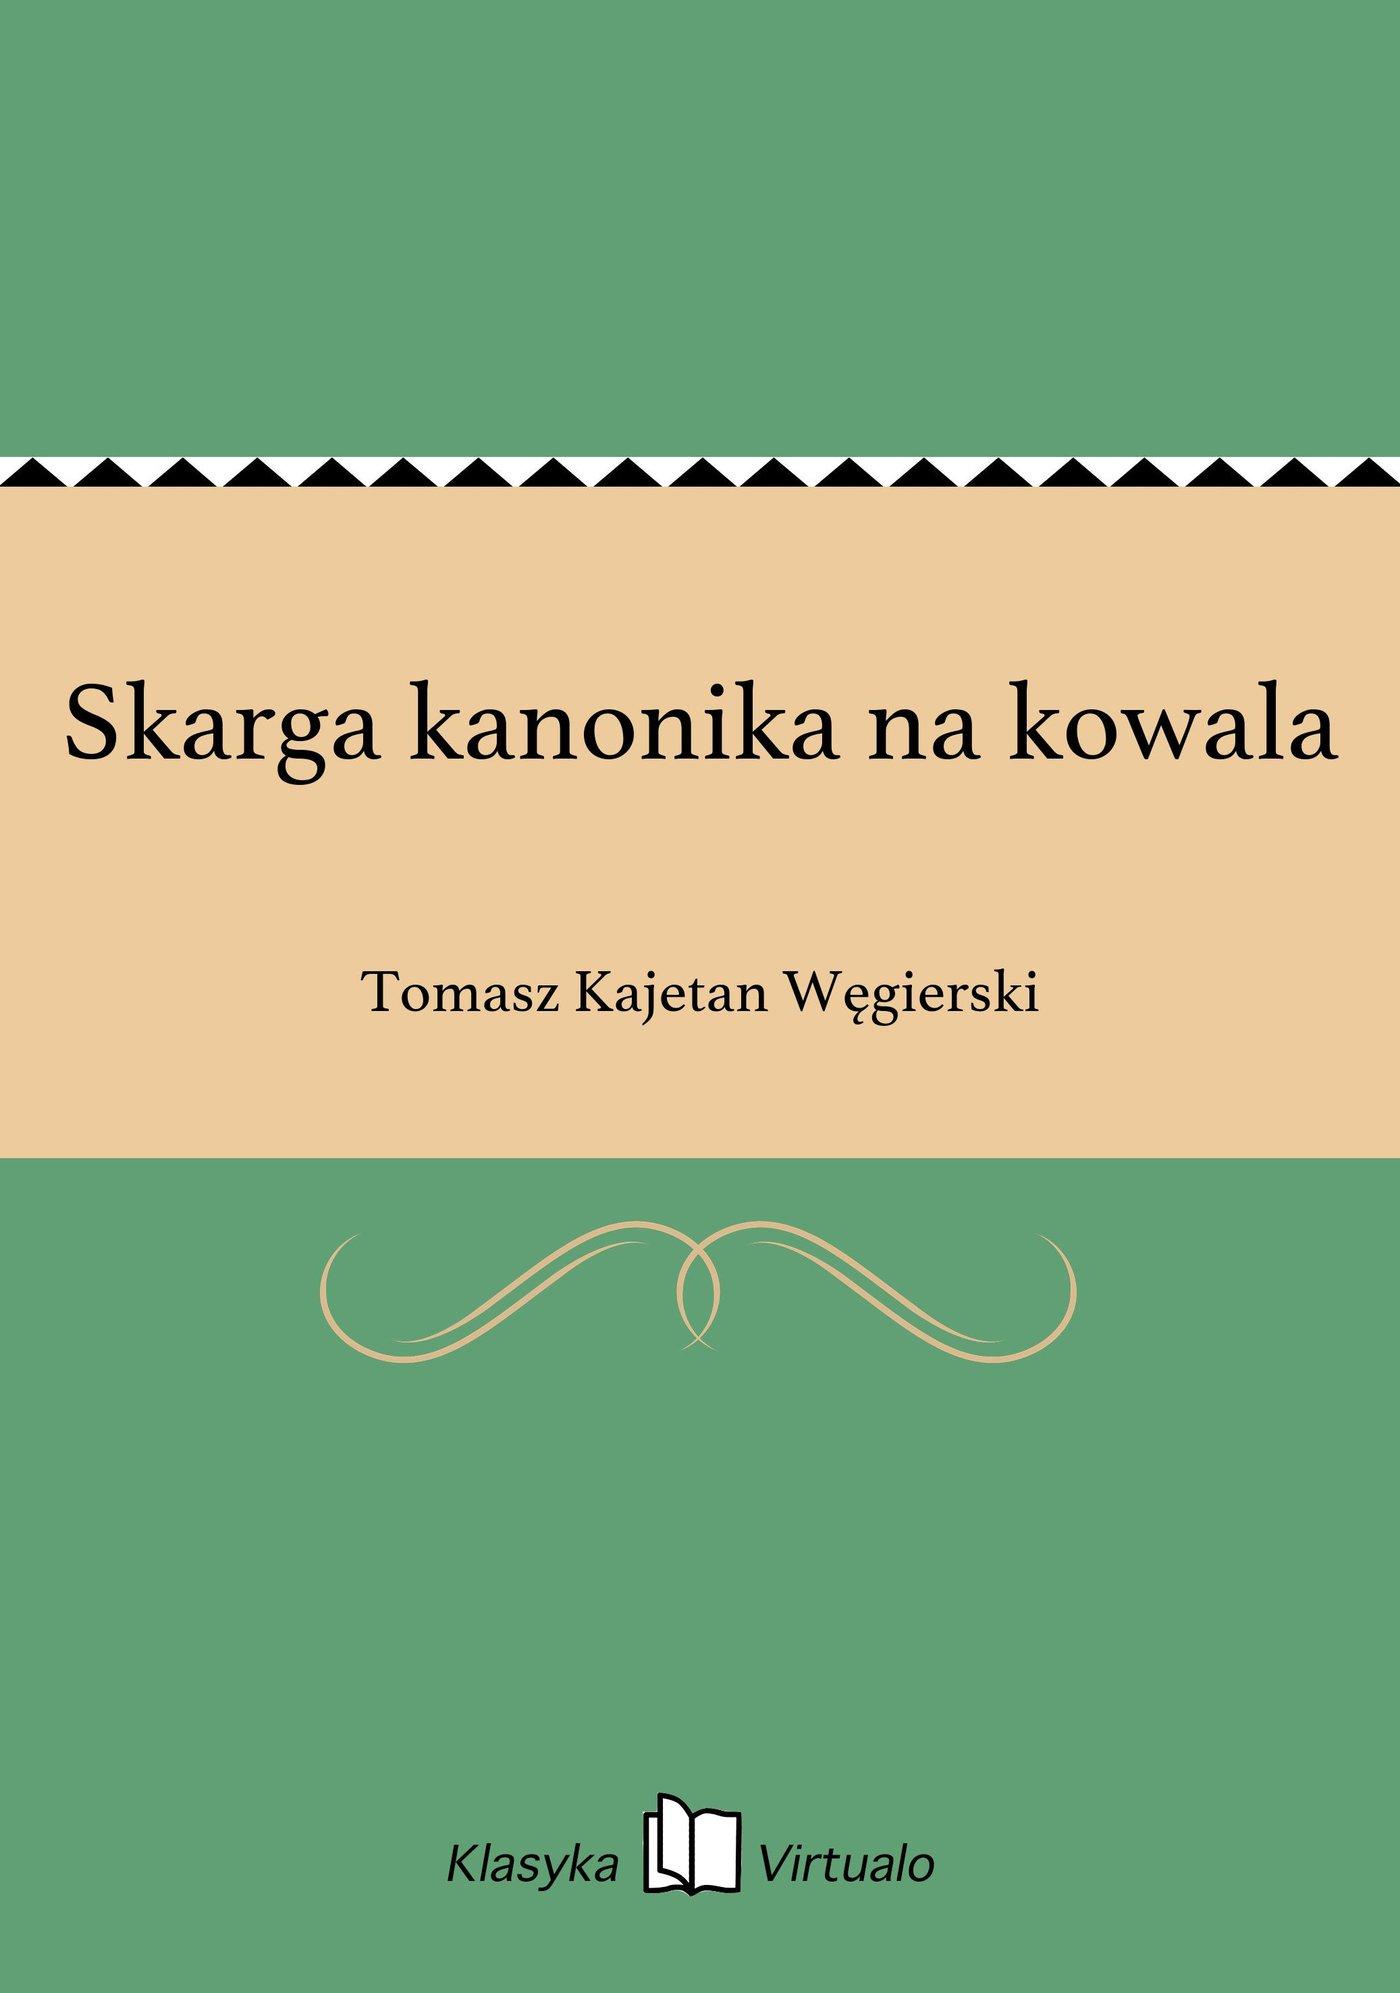 Skarga kanonika na kowala - Ebook (Książka na Kindle) do pobrania w formacie MOBI